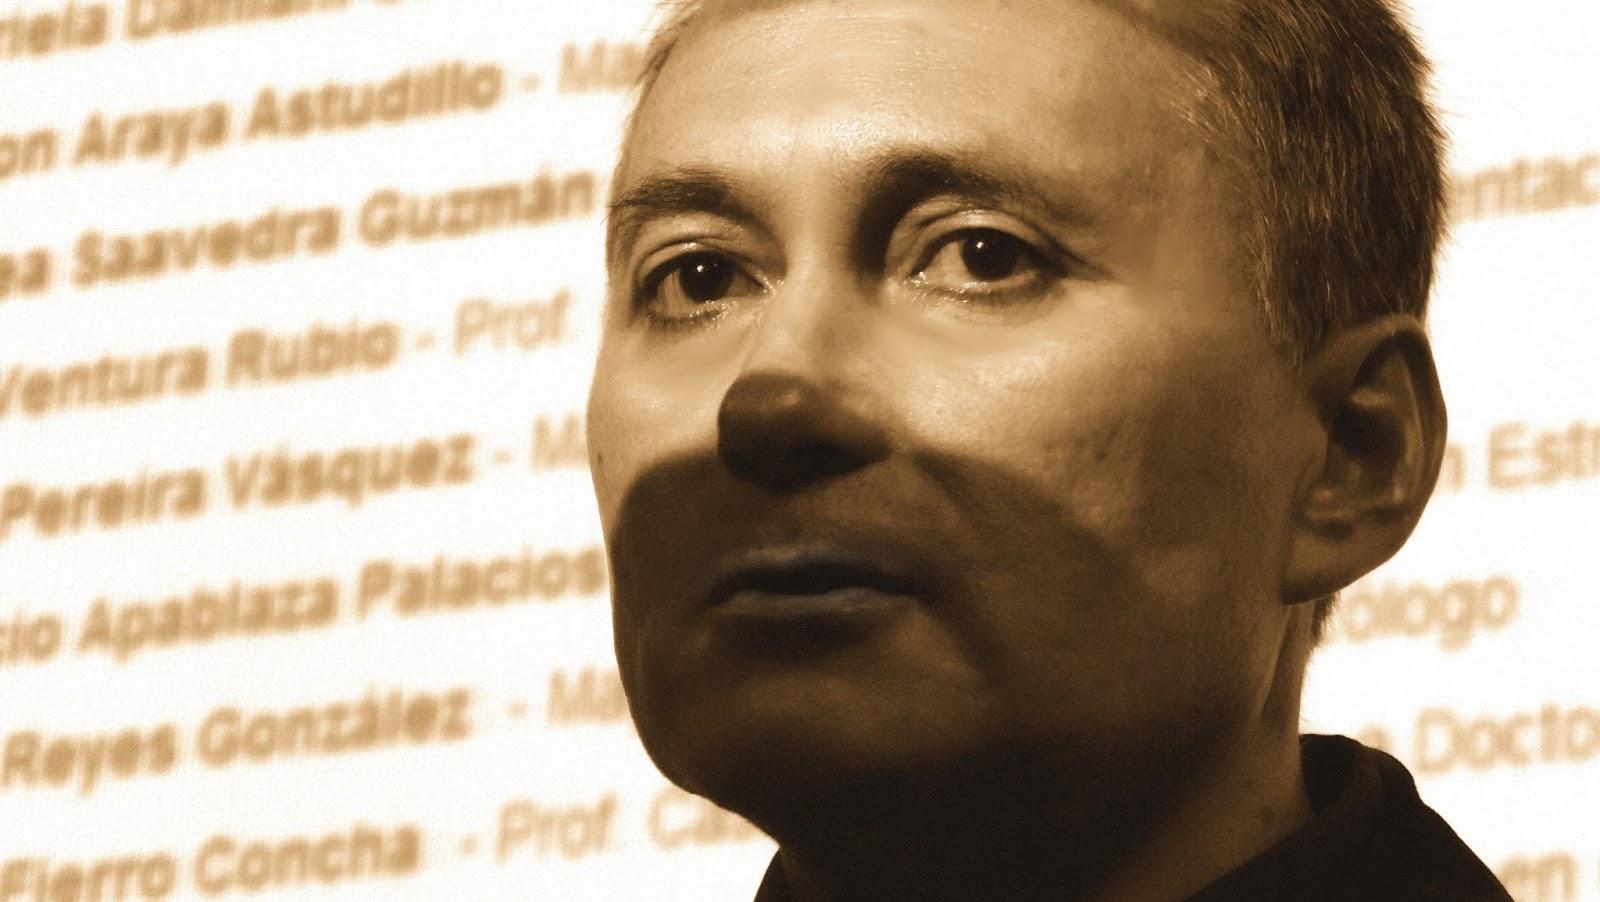 http://2.bp.blogspot.com/-P-6bx_EydSQ/U1CBDFNvszI/AAAAAAAASMY/UeBxKxlm3iw/s1600/Adolfo+Vasquez+Rocca+PHD.+2+BN+05+_+Portrait+Scielum_+2014__P3142654.jpeg